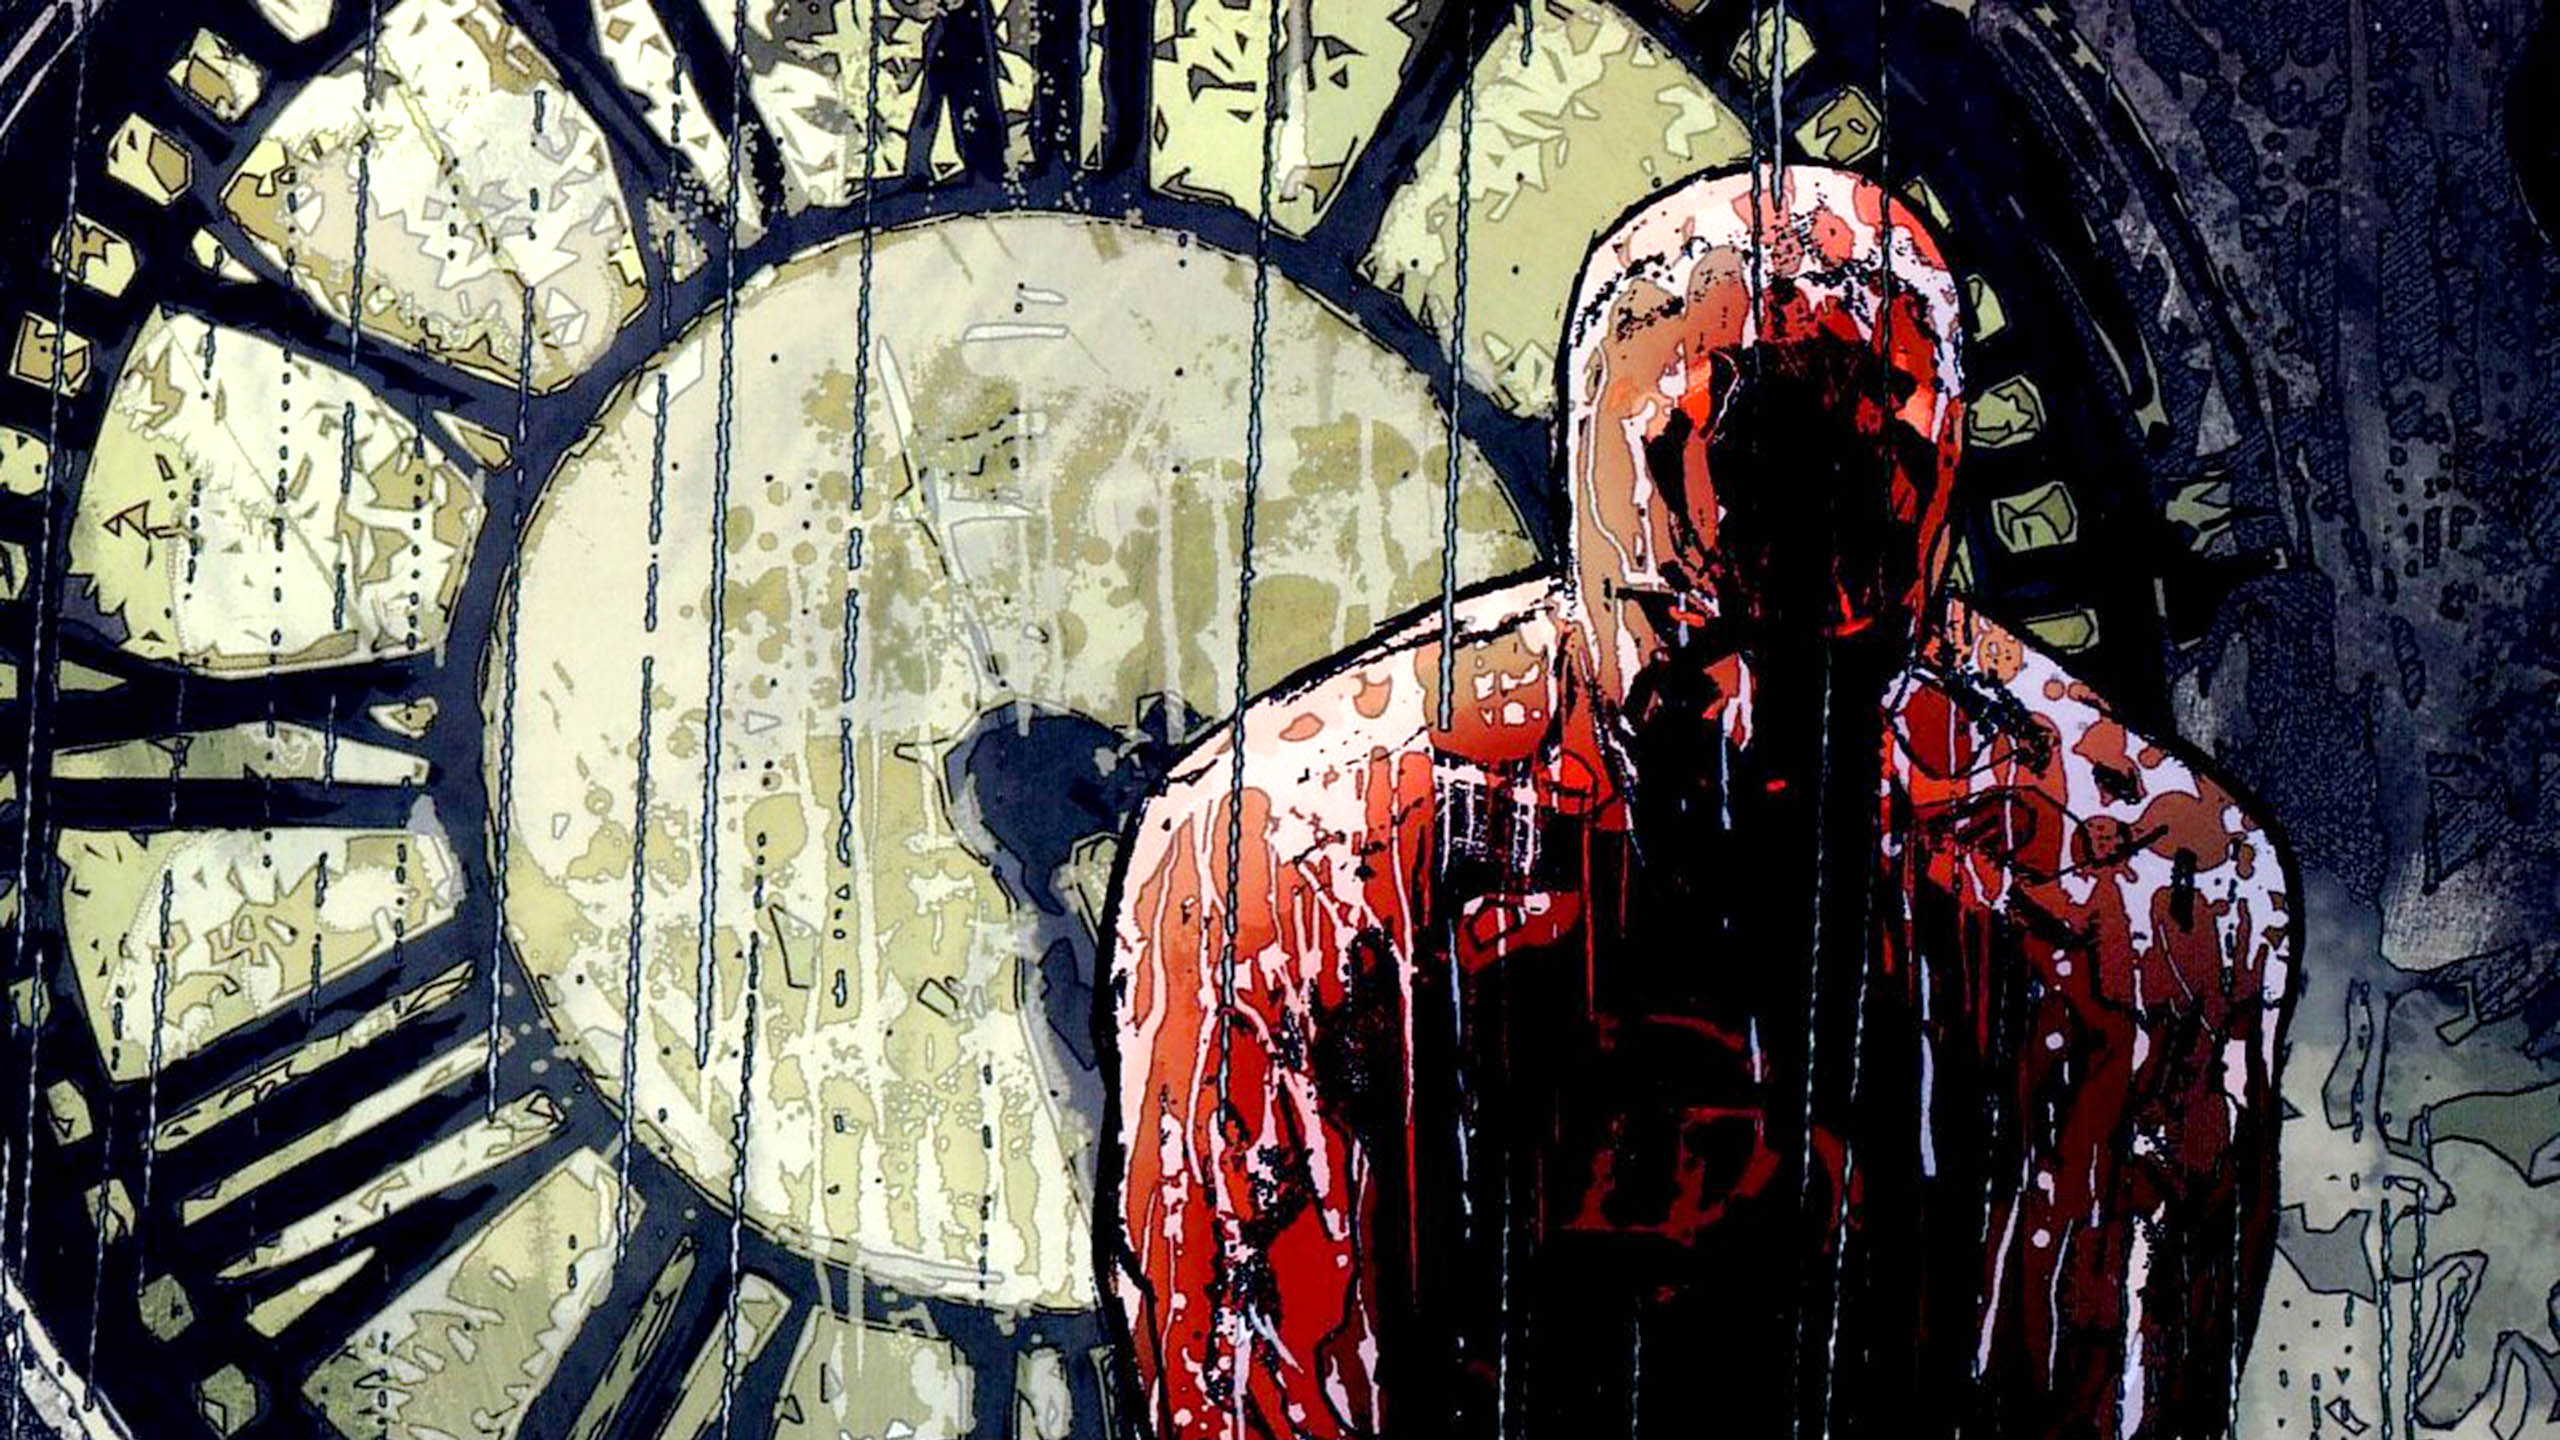 Daredevil Wallpaper – Epic Wallpaperz